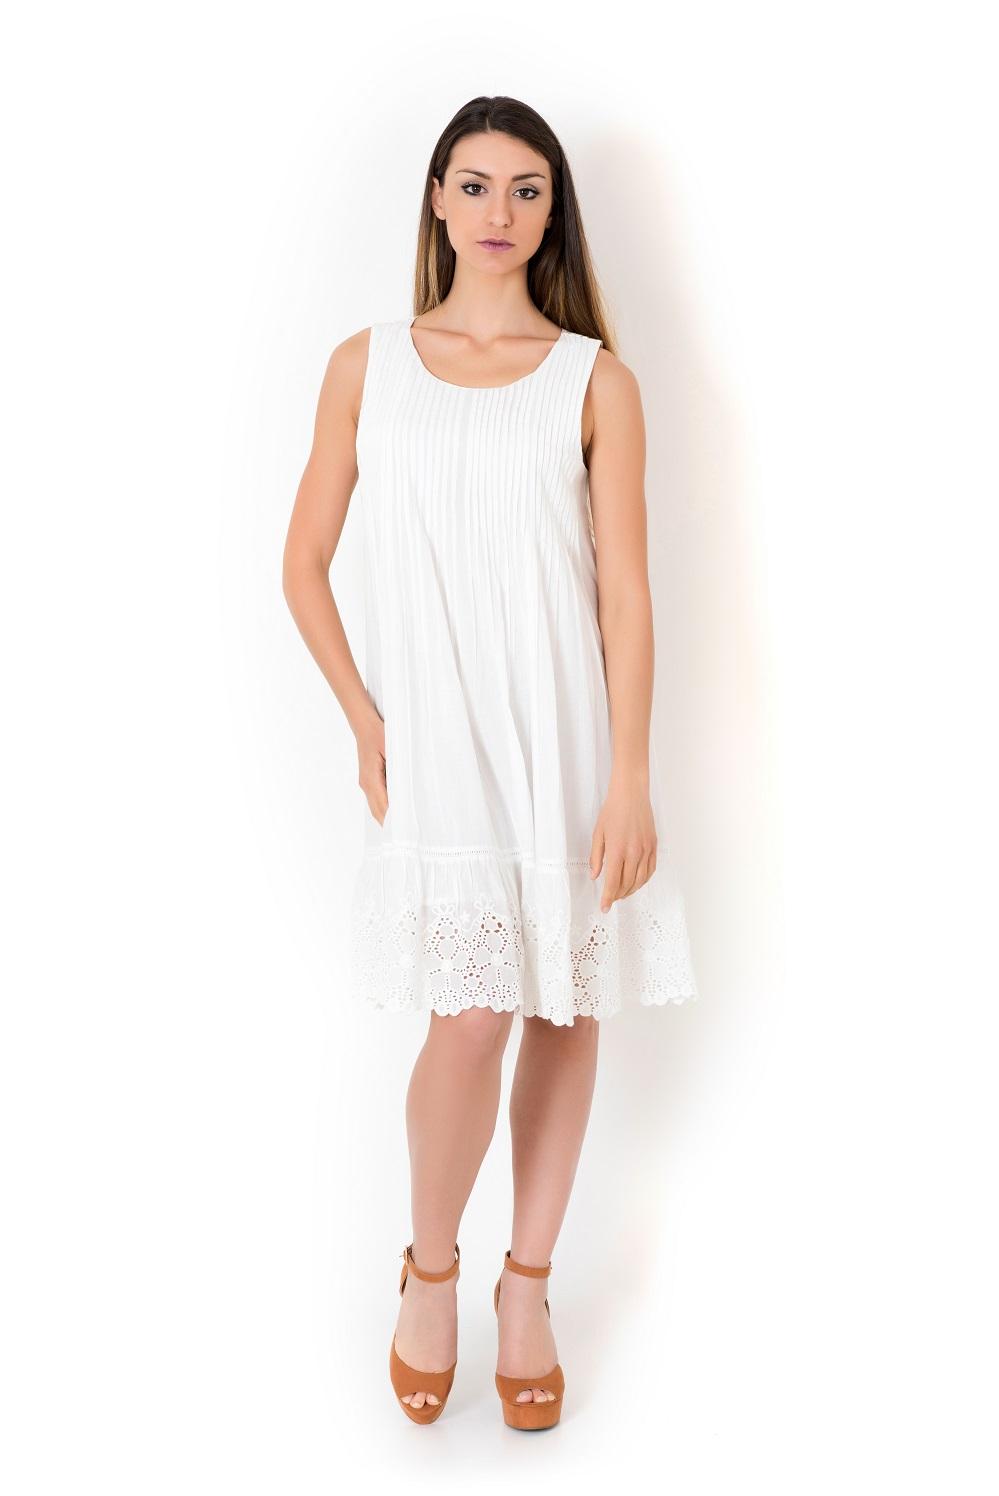 f12d5774bf0 Пляжное платье сарафан ICONIQUE - IC8-014 - FLIRT-TIME.RU – Нижнее ...